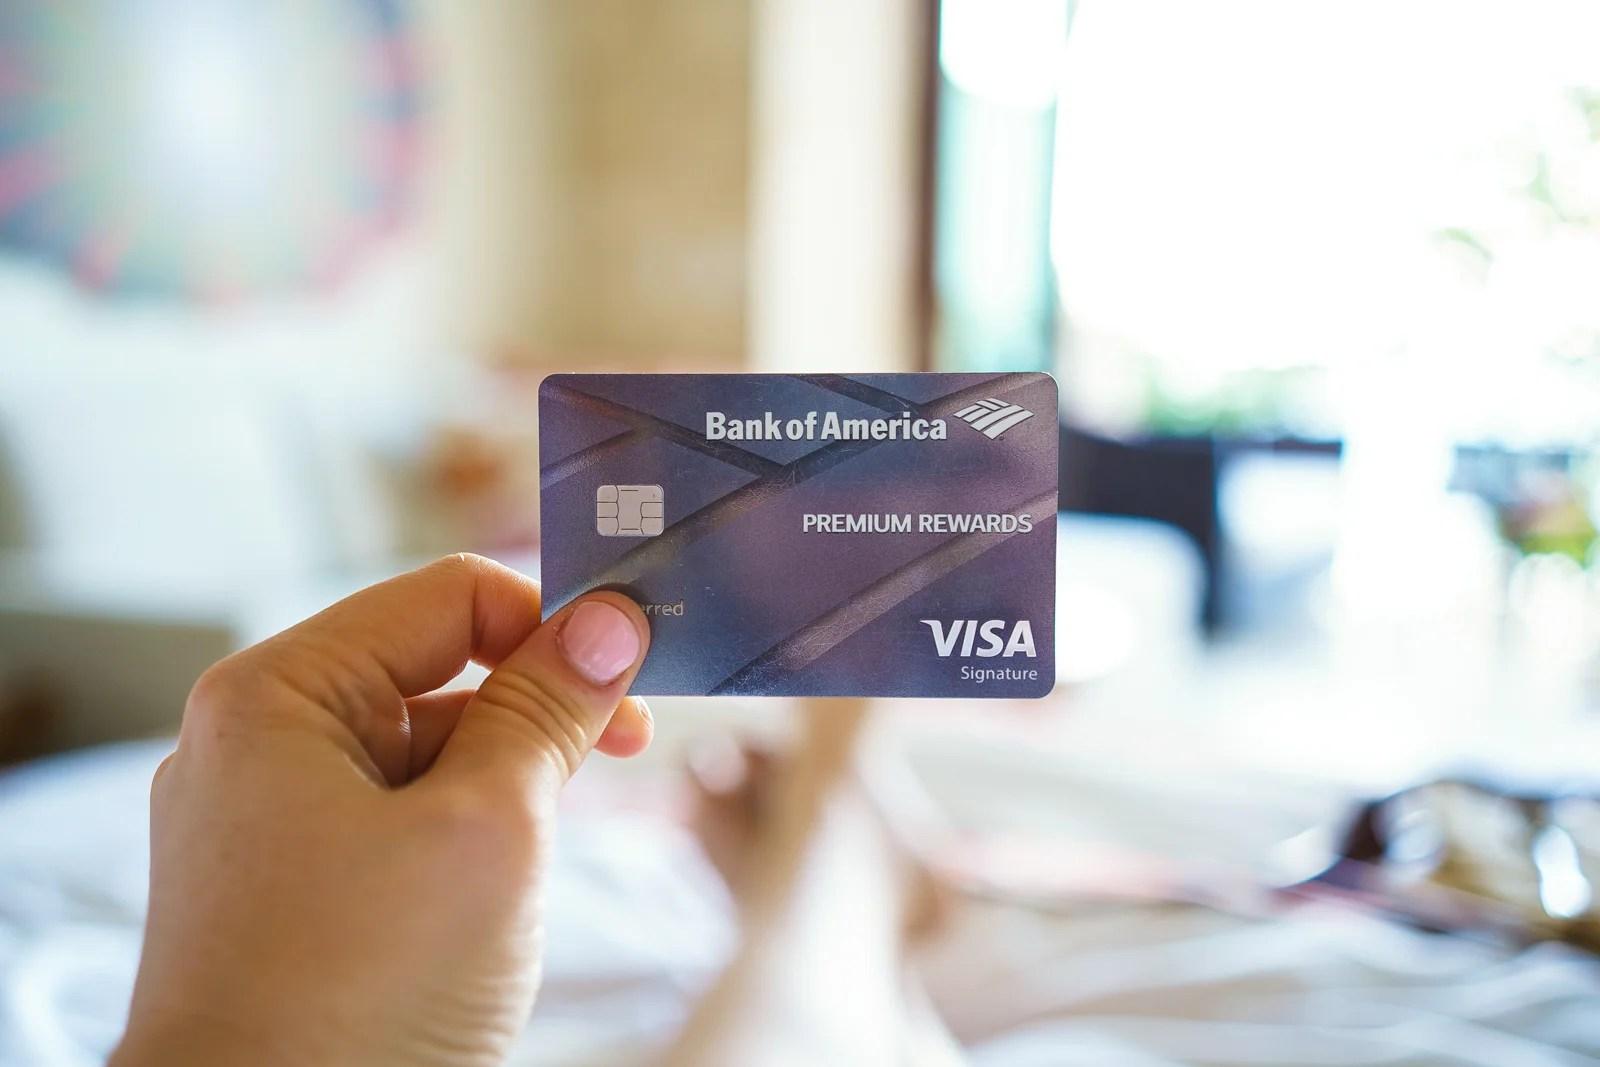 5 Reasons to Get the Bank of America Premium Rewards Credit Card